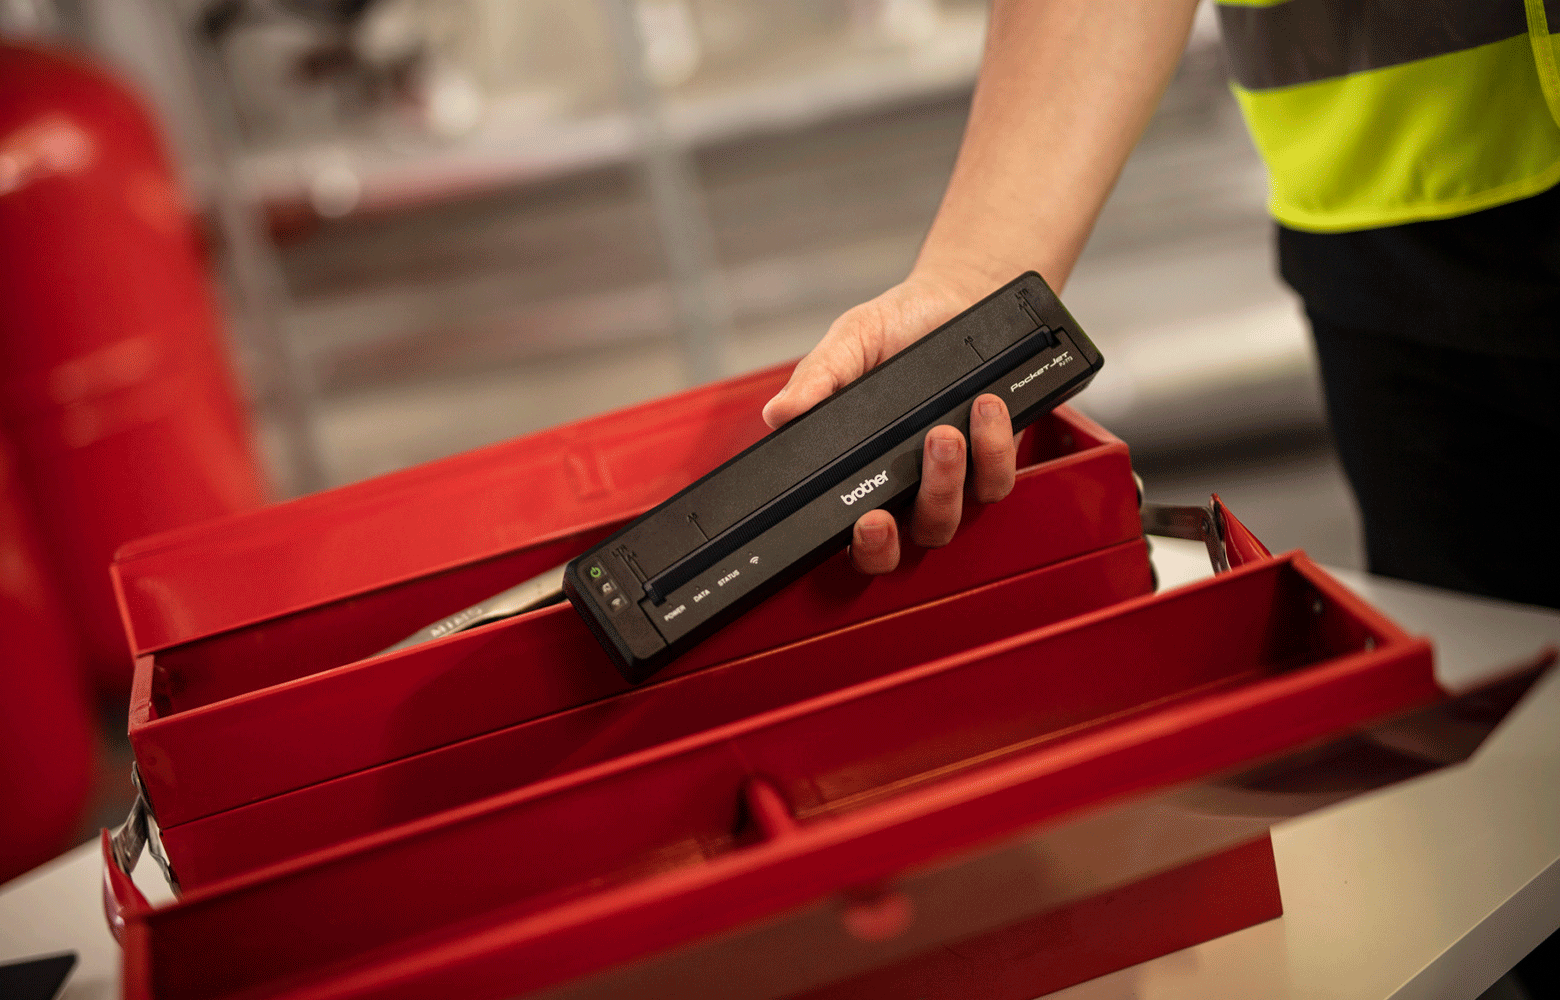 Workman putting black pj printer in red worbox